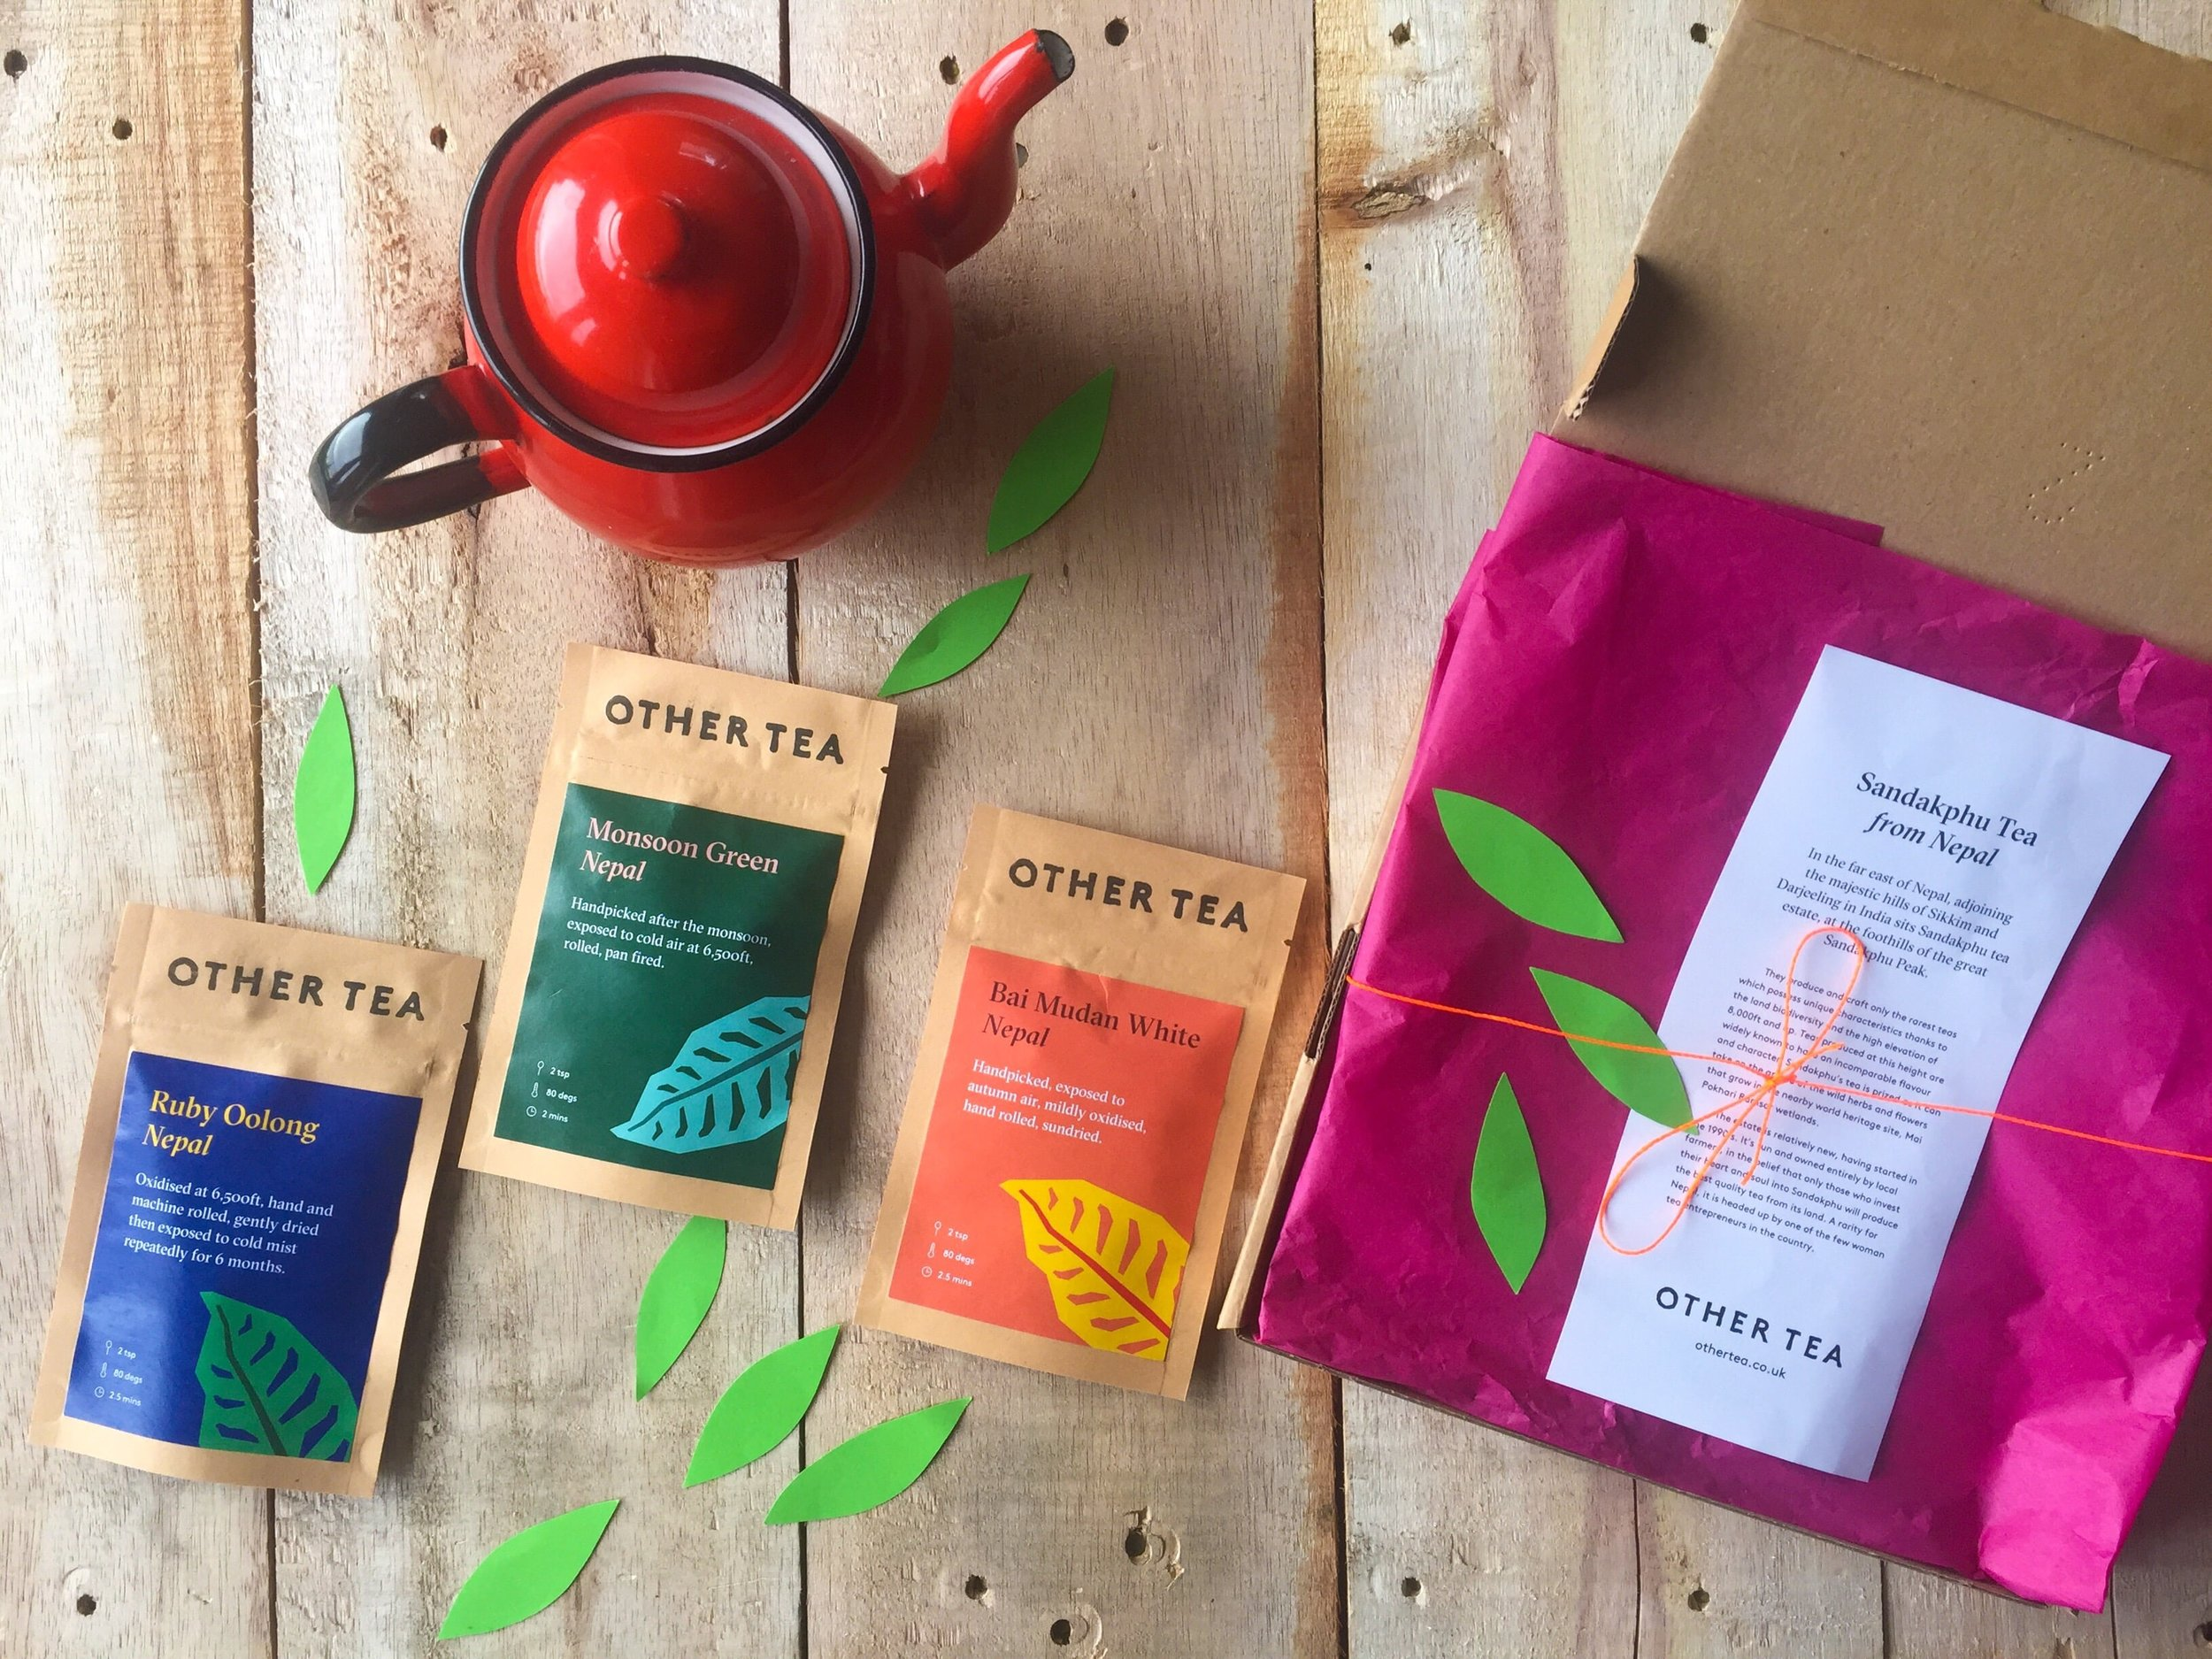 Other Tea - Green Tea Subscription Box